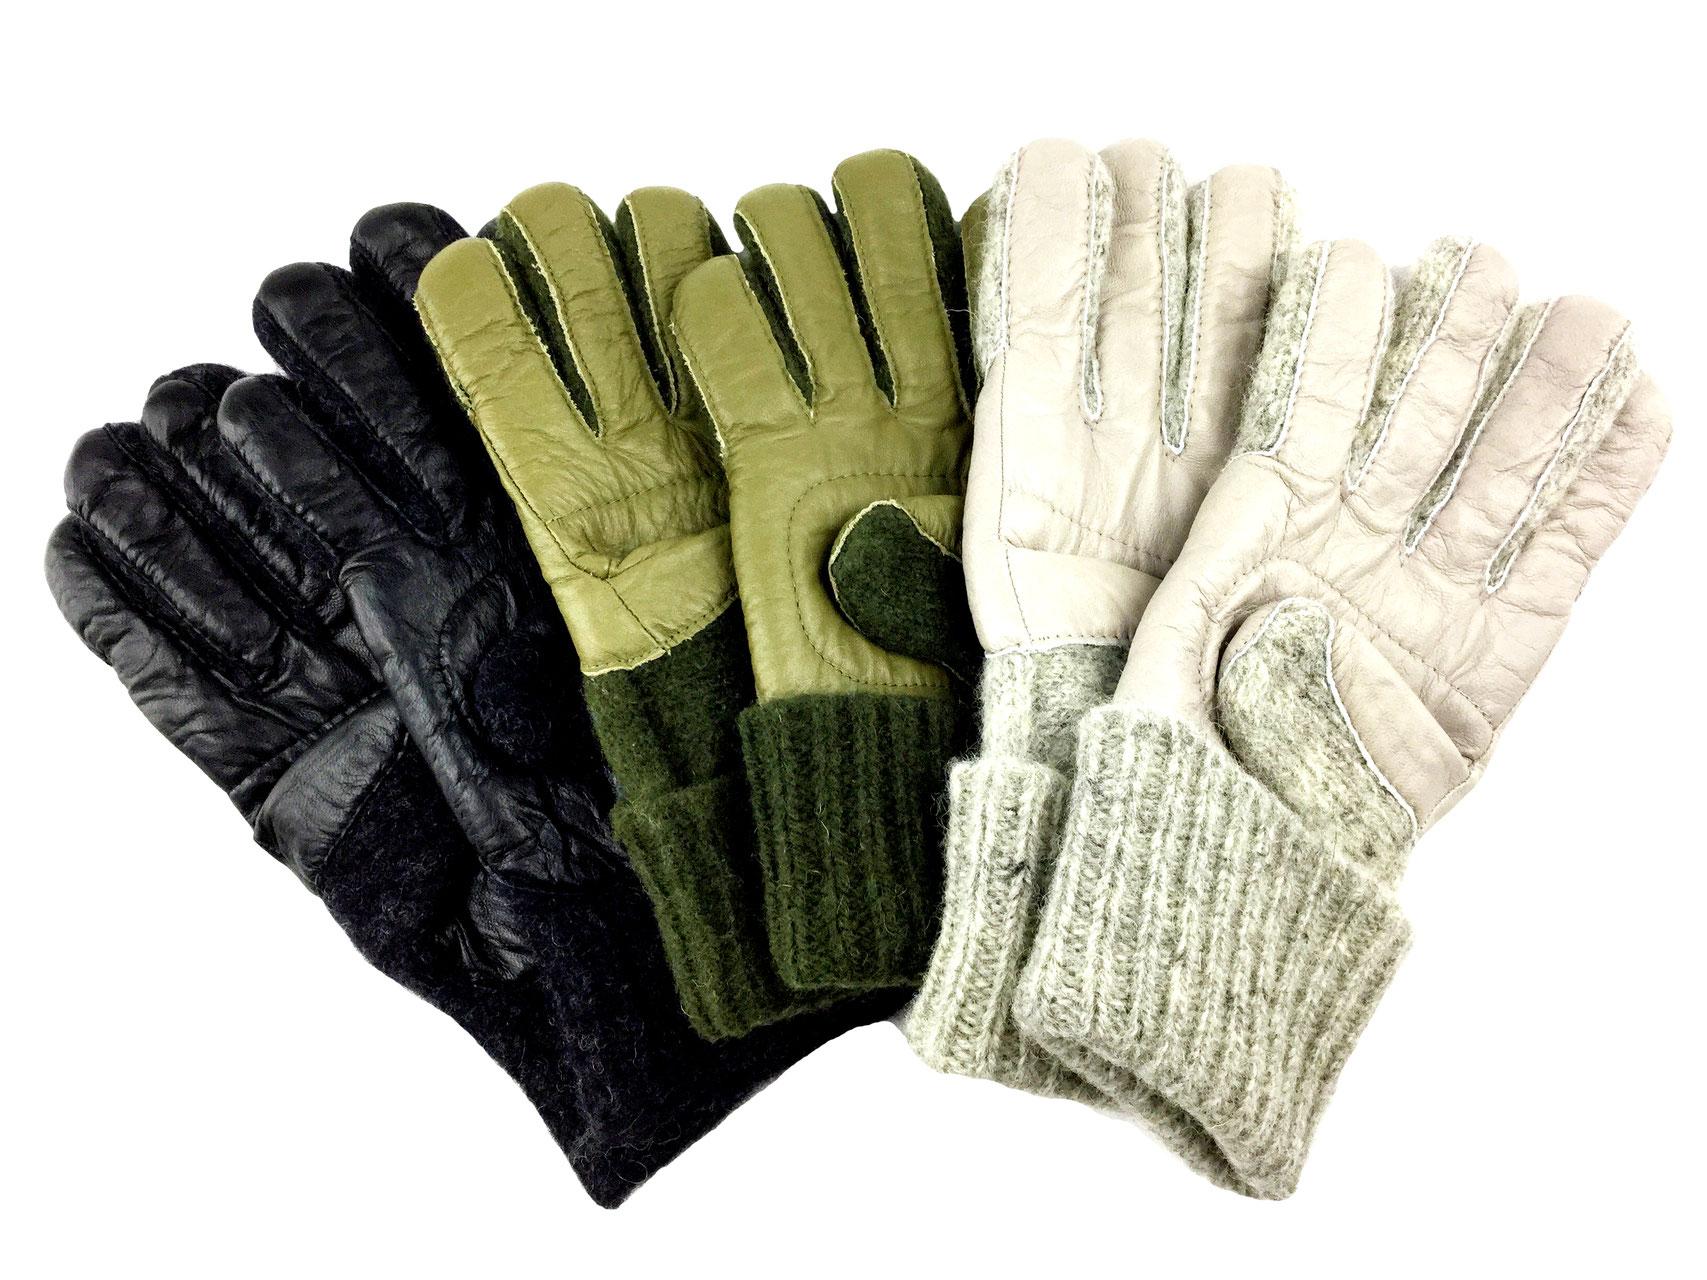 12ace5c5183 Dachstein Wool Gloves w  Leather Trim 2111 - Sweater Chalet